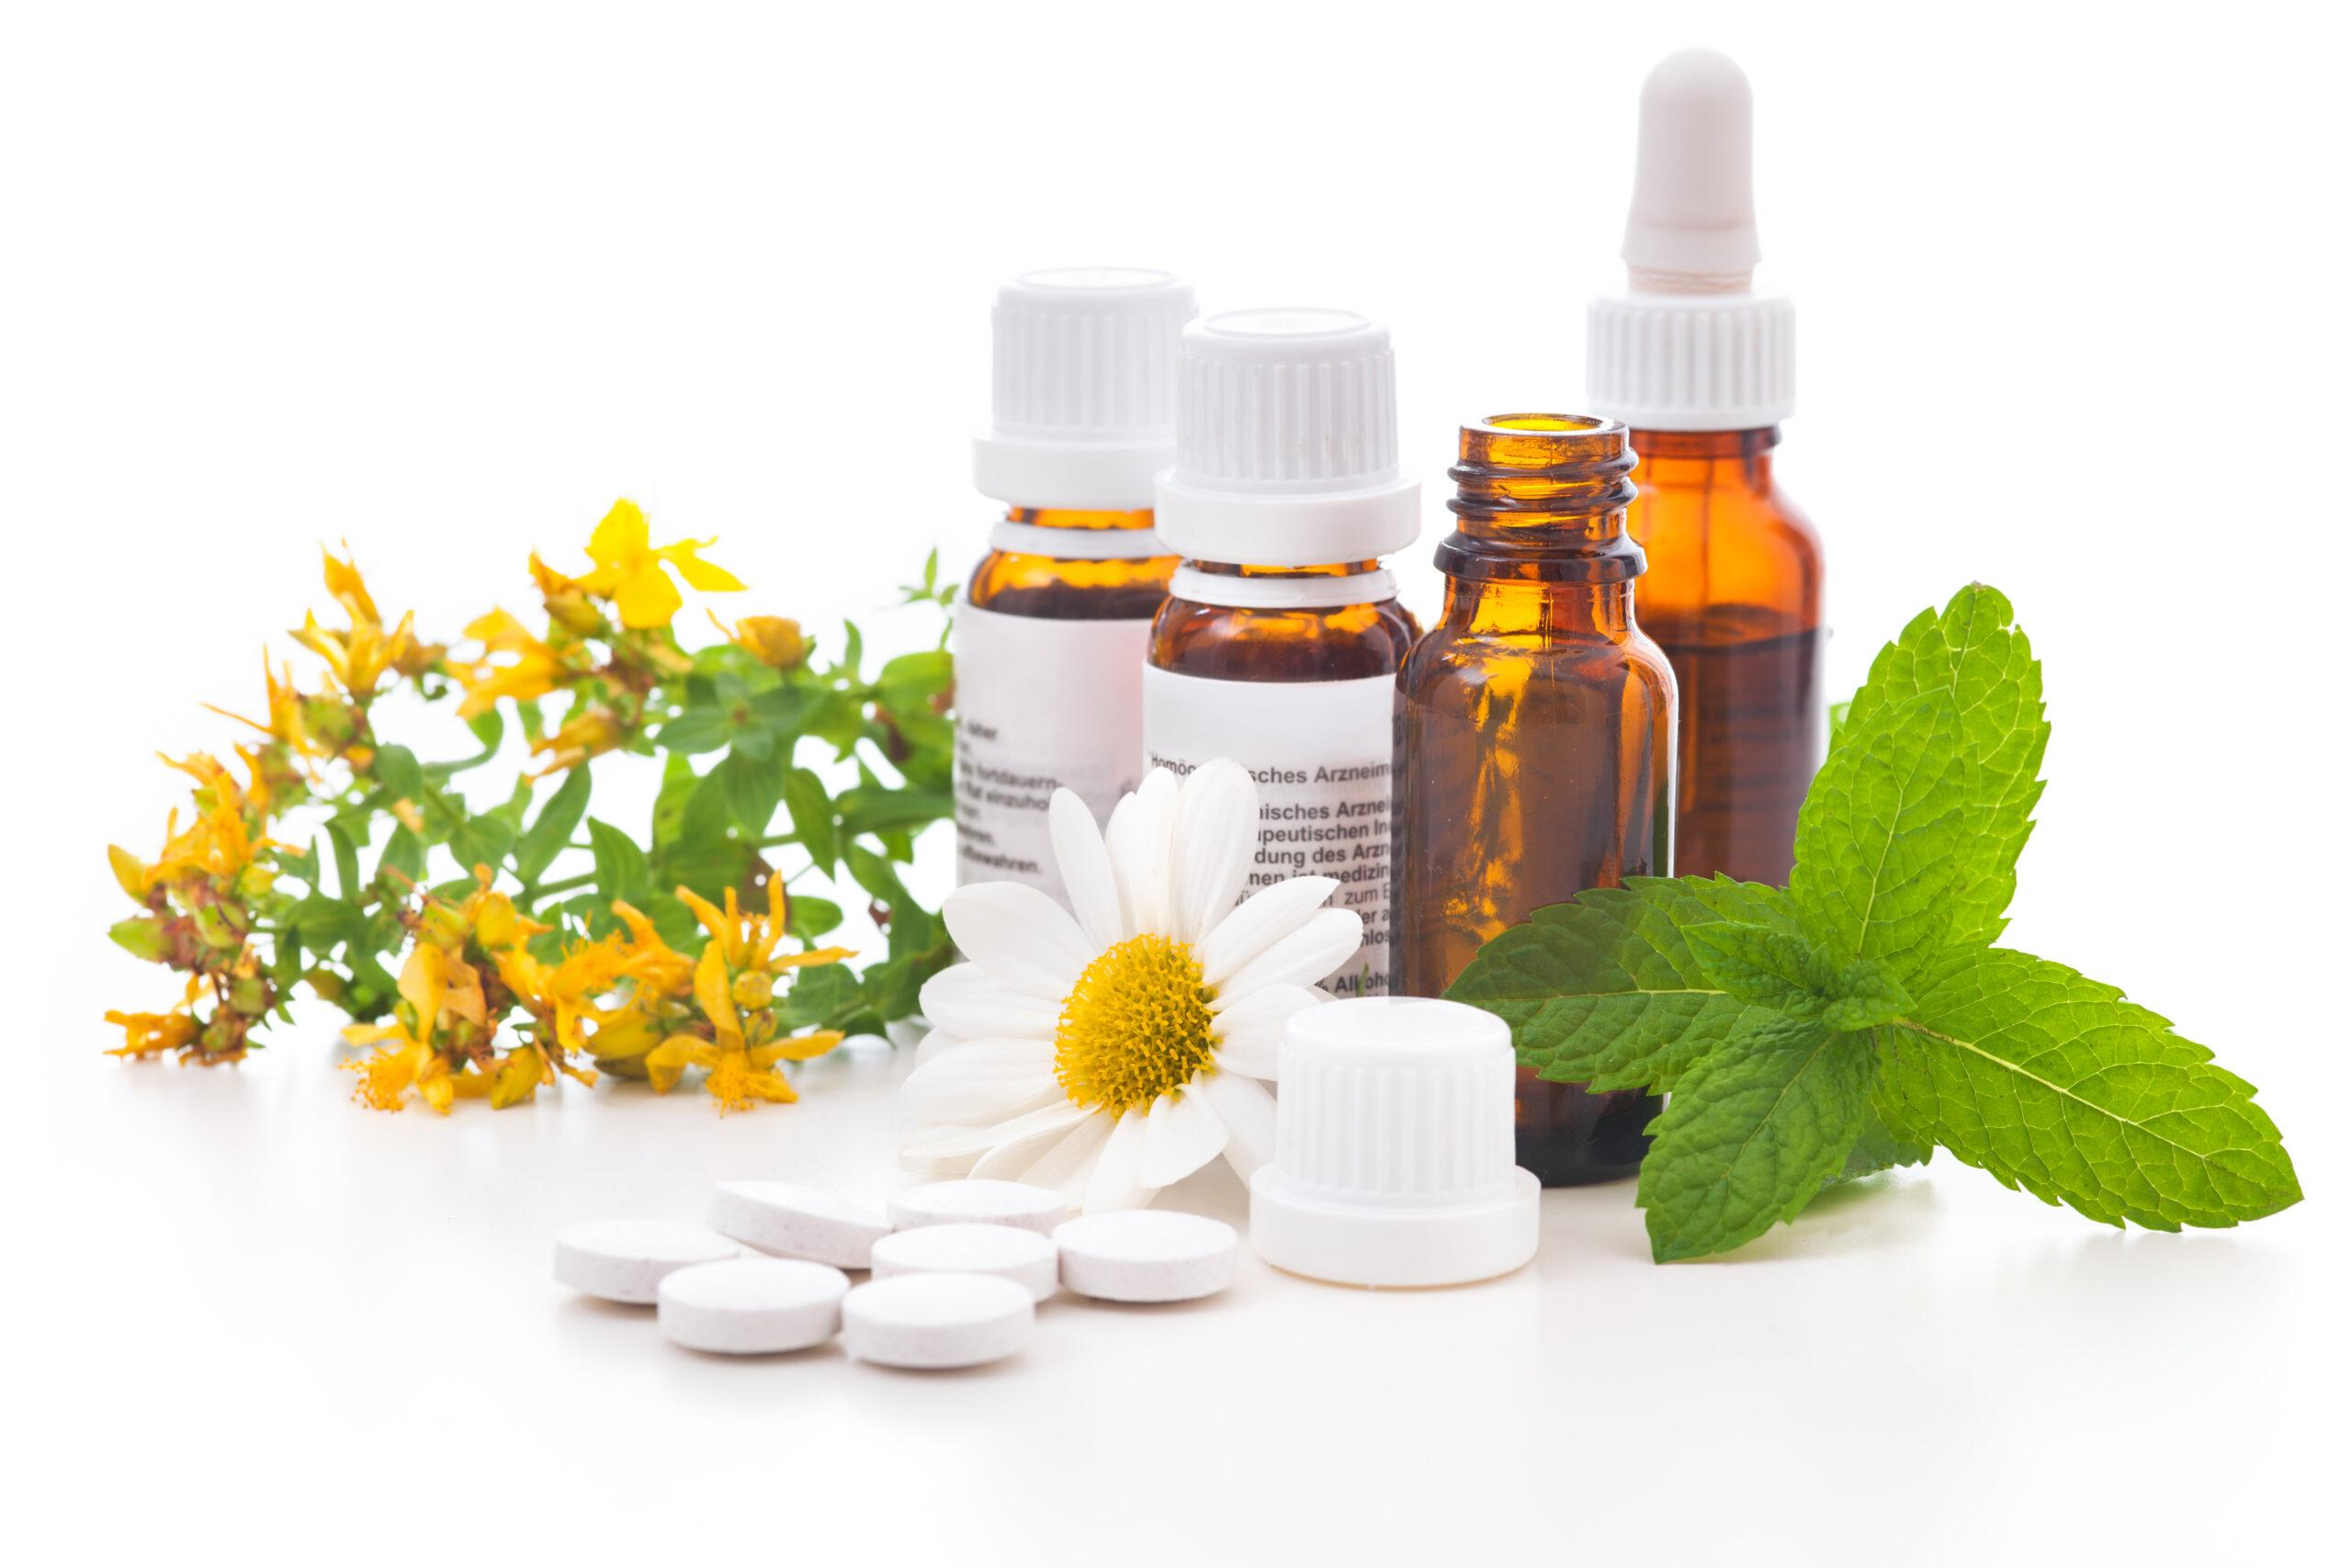 naturopathic medicine supplements